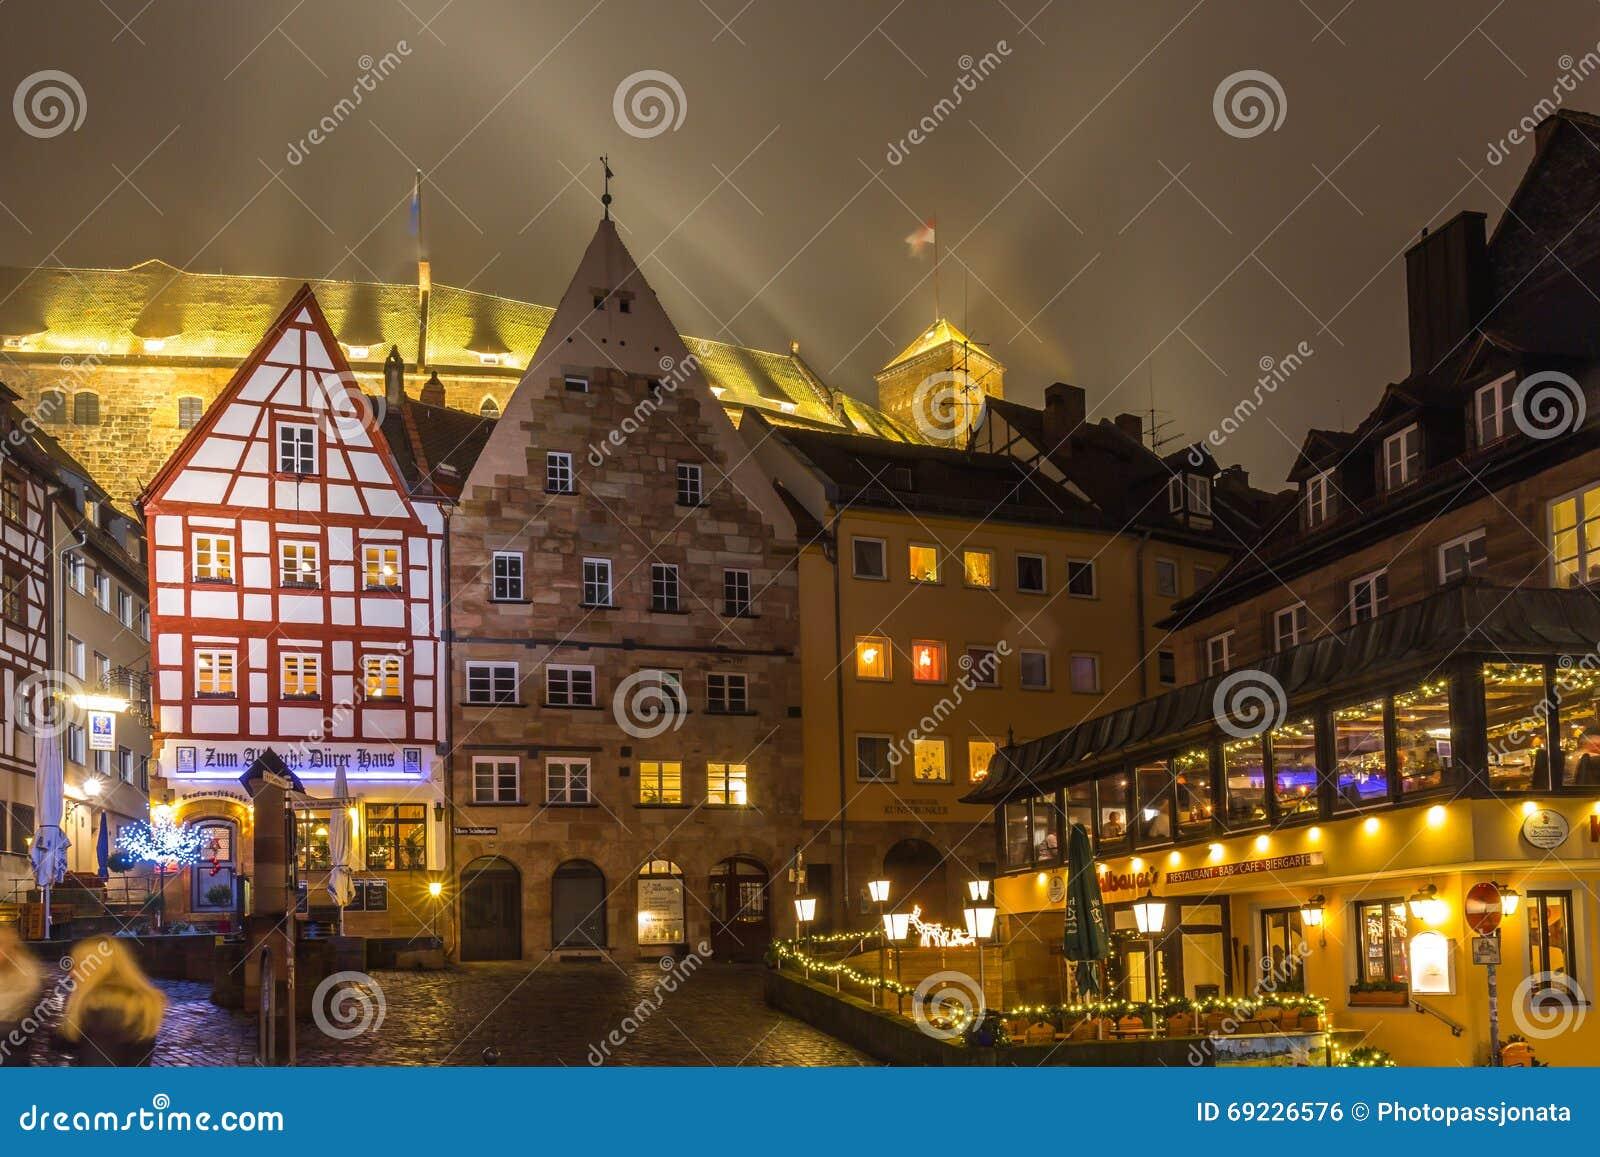 Nuremberg- foggy night-old town